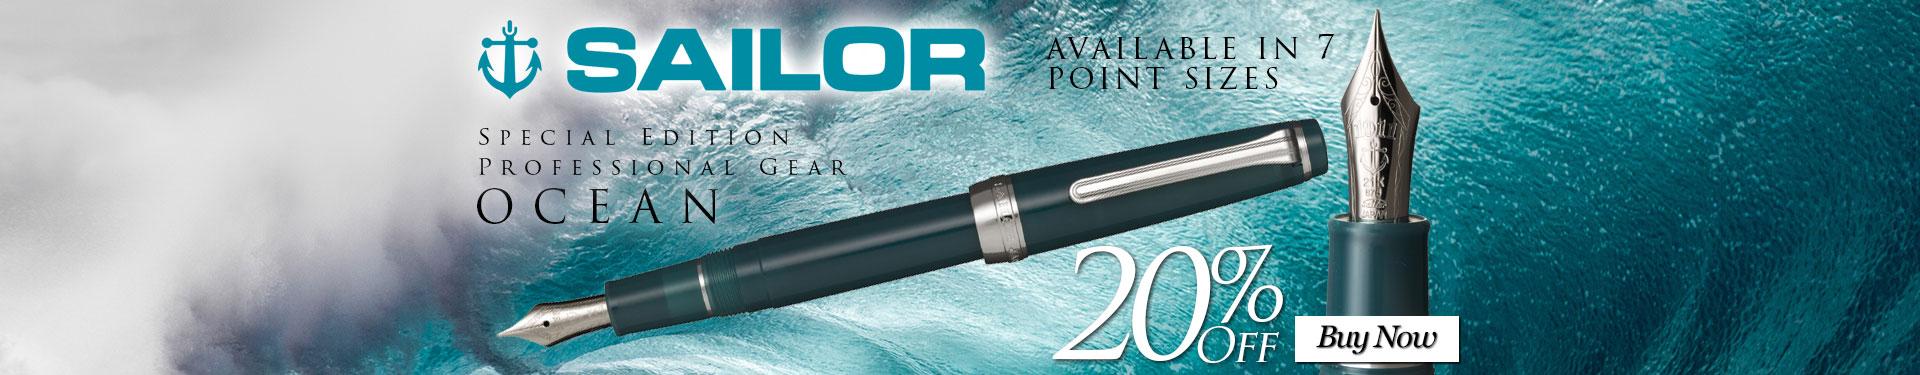 Sailor Special Edition Professional Gear Slim Ocean 20% Off